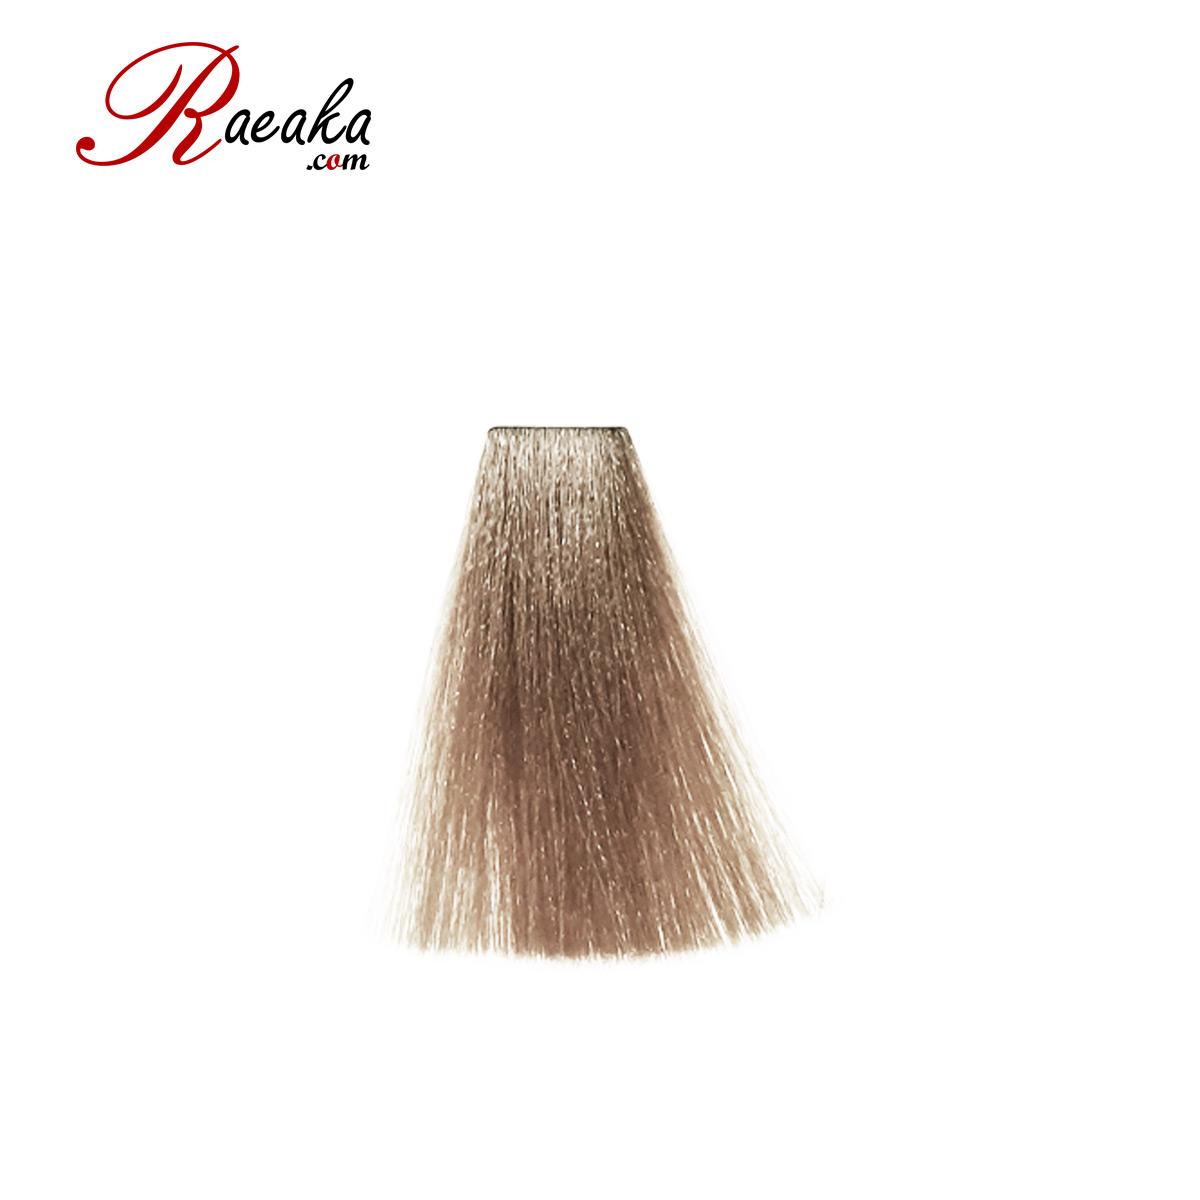 رنگ مو دوشس سری لوکس شماره 32-9 حجم 125 میلی لیتر